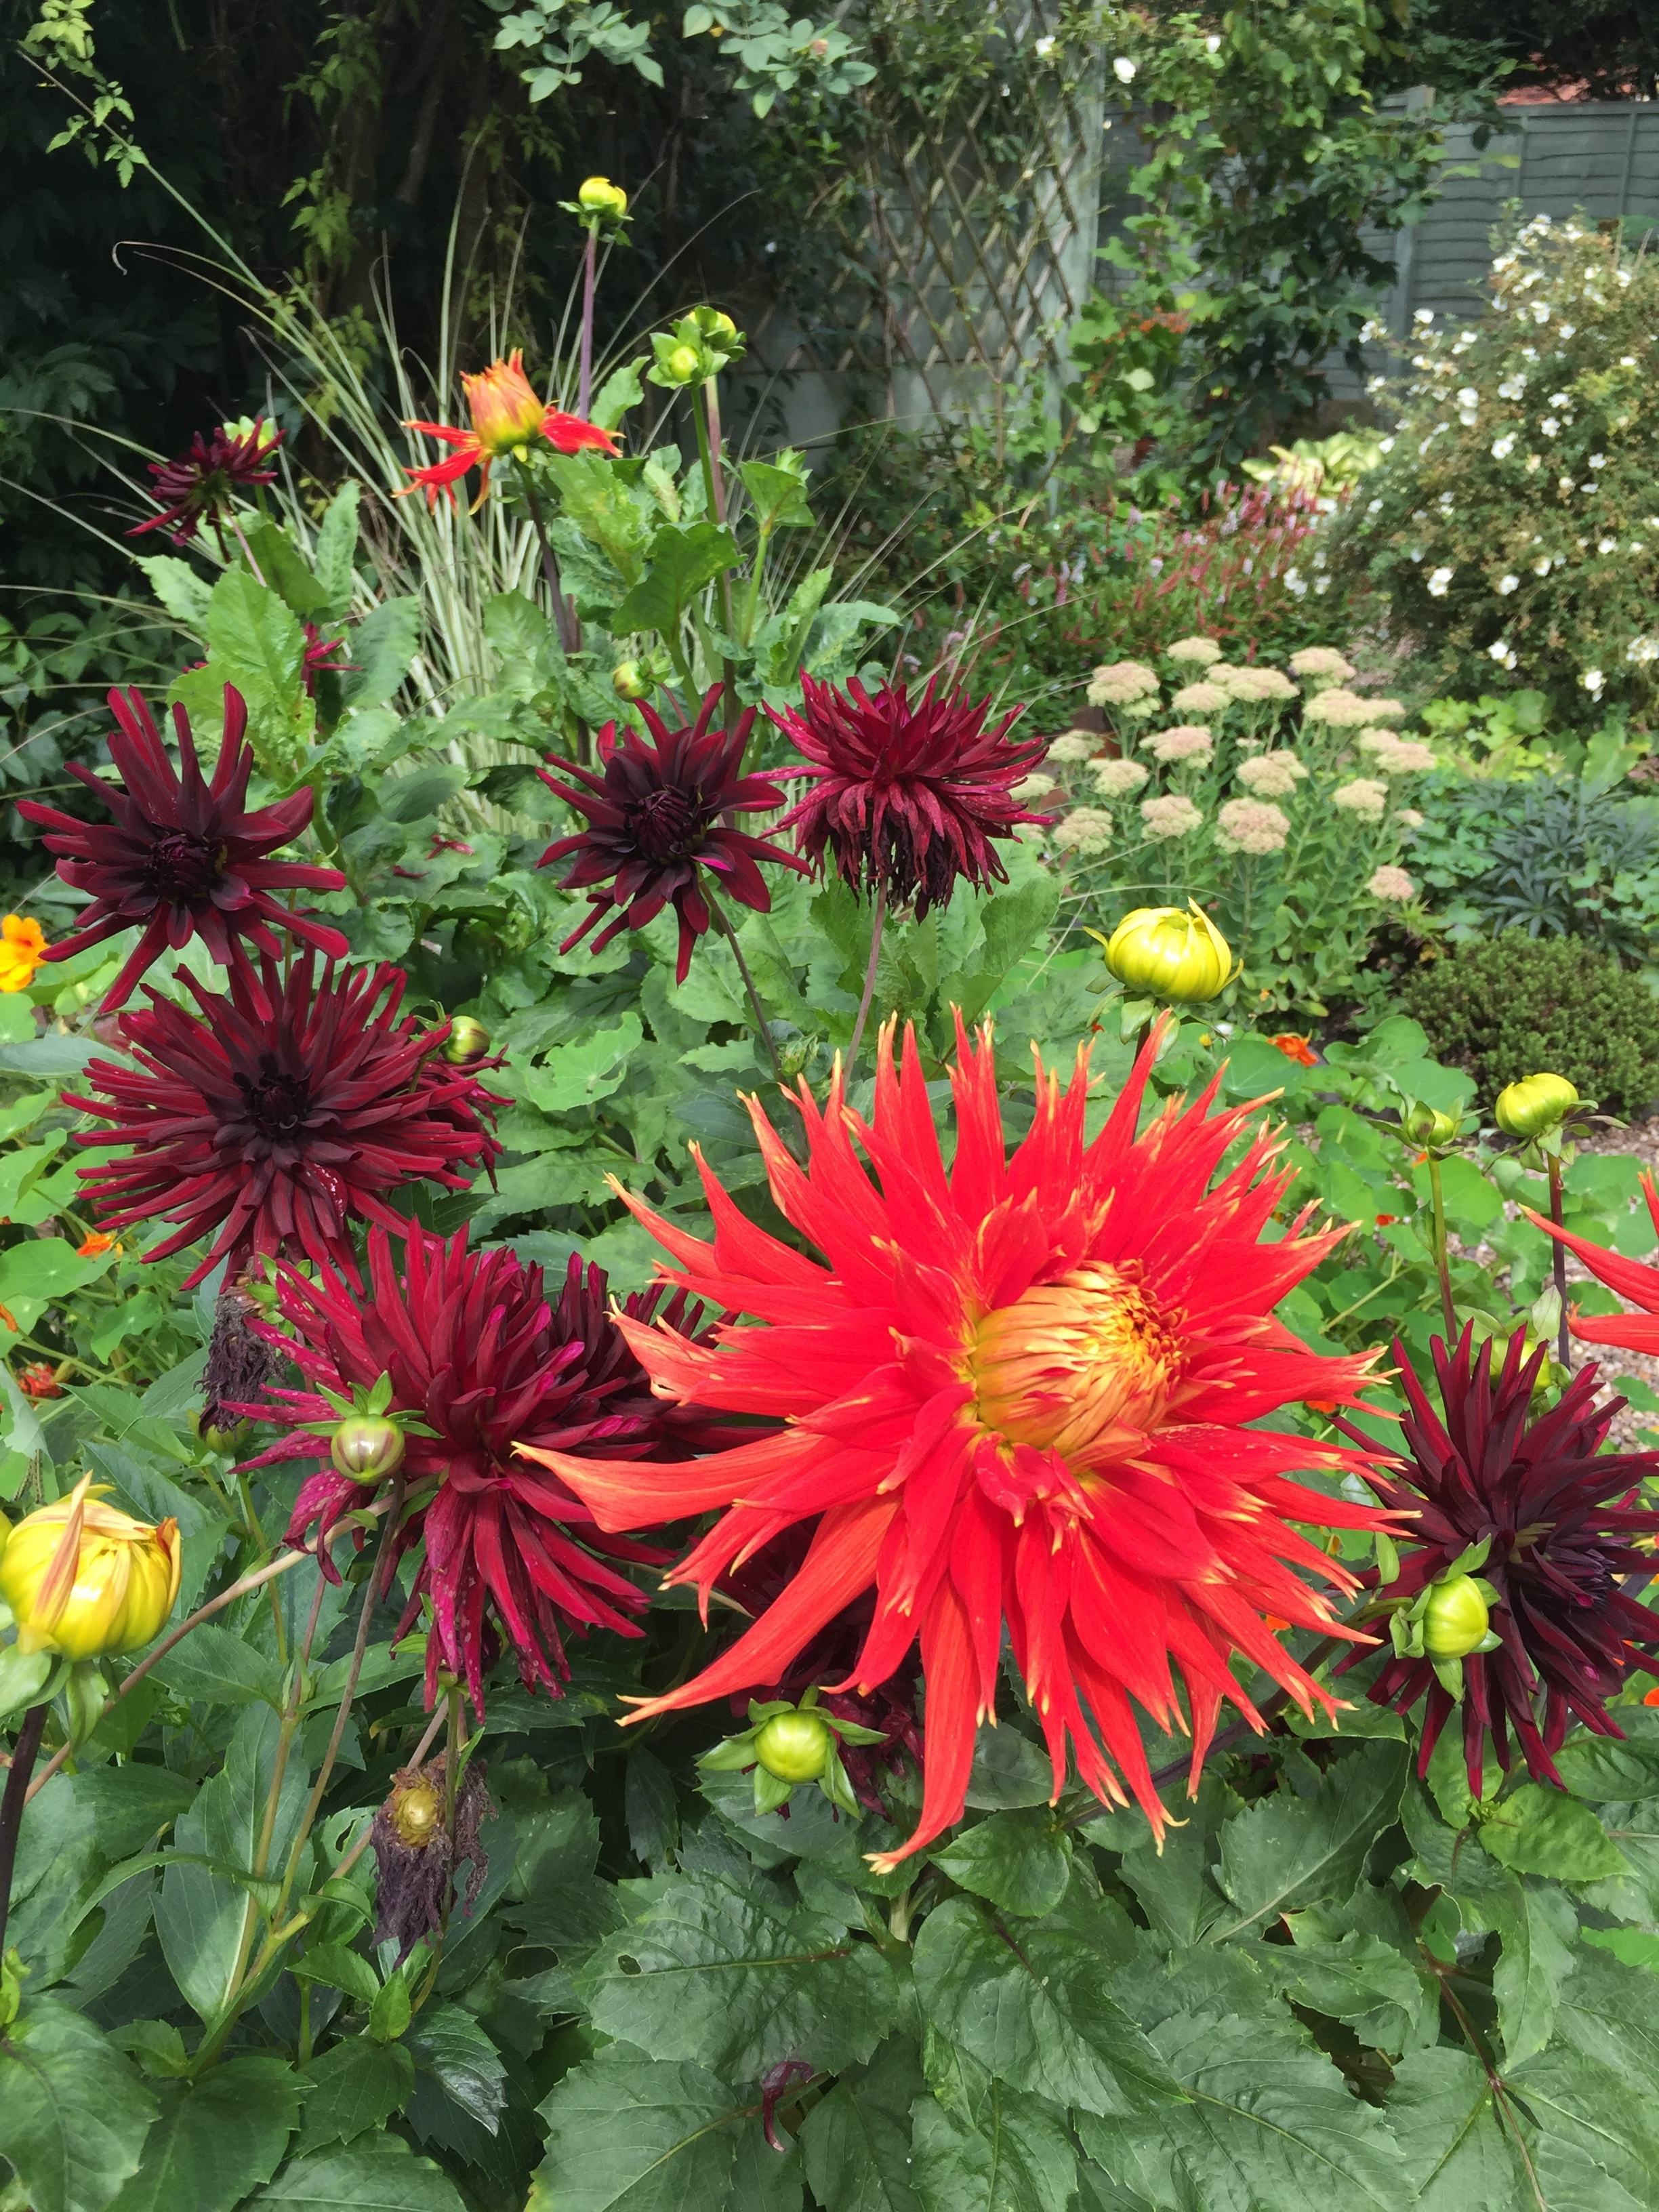 Dahlia 'Show and Tell'in my mum's garden.